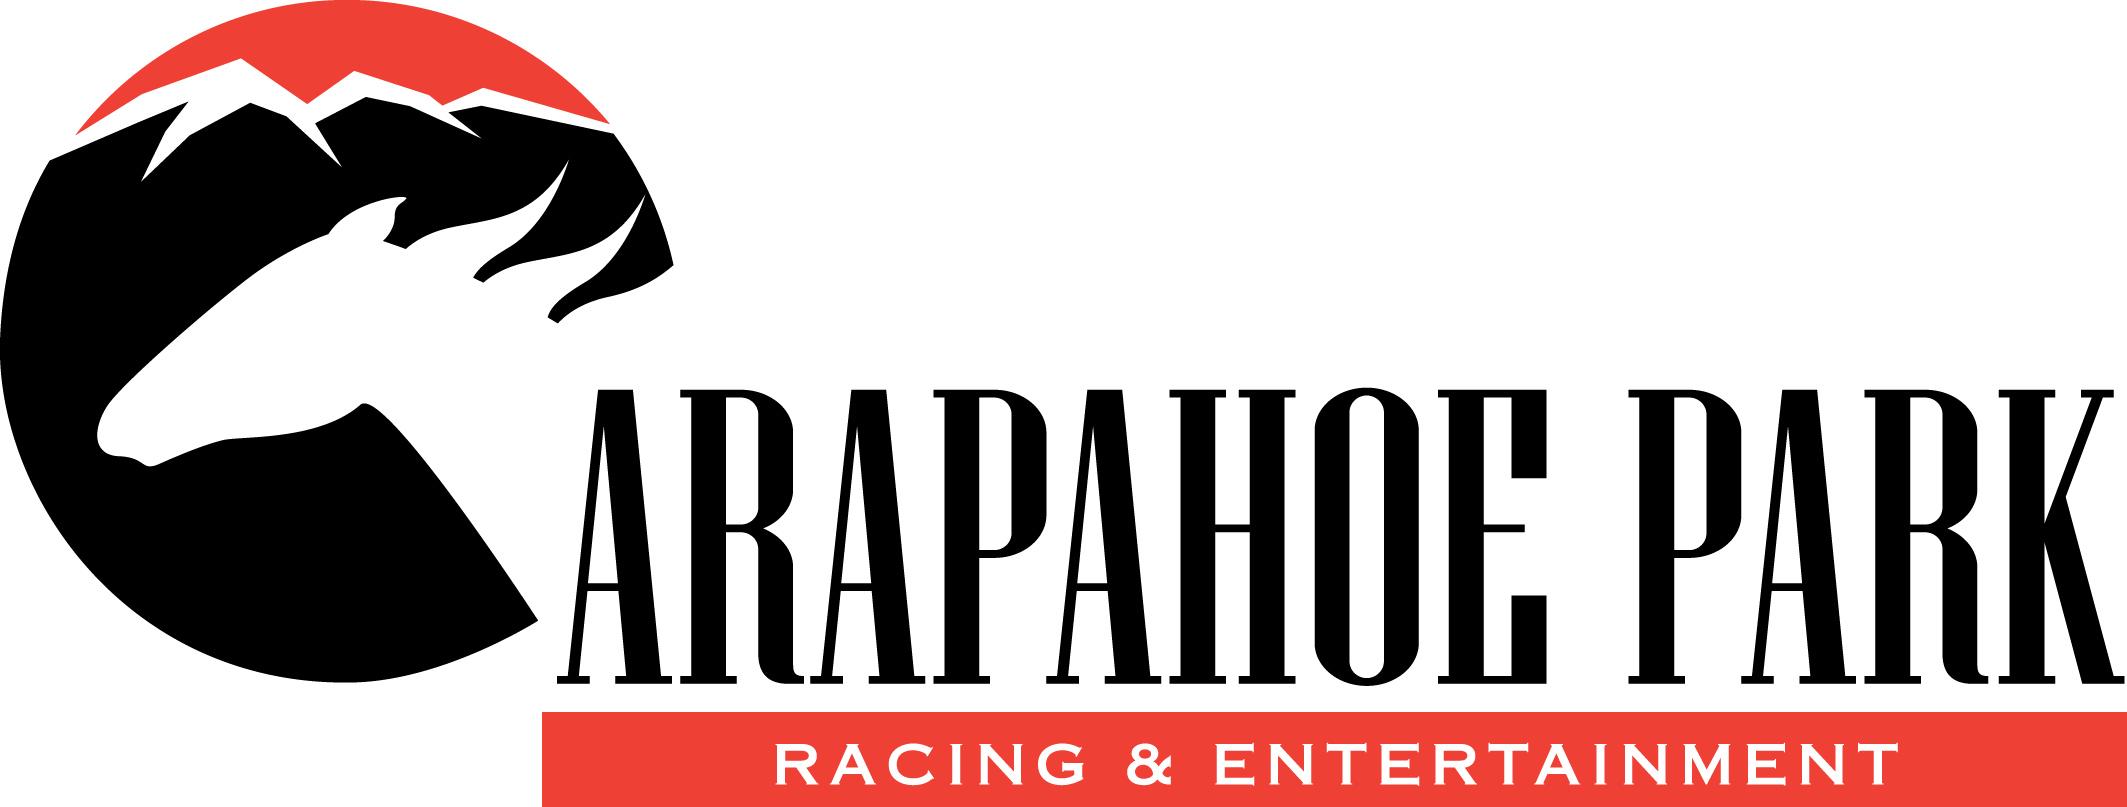 Arap logo HORSE only